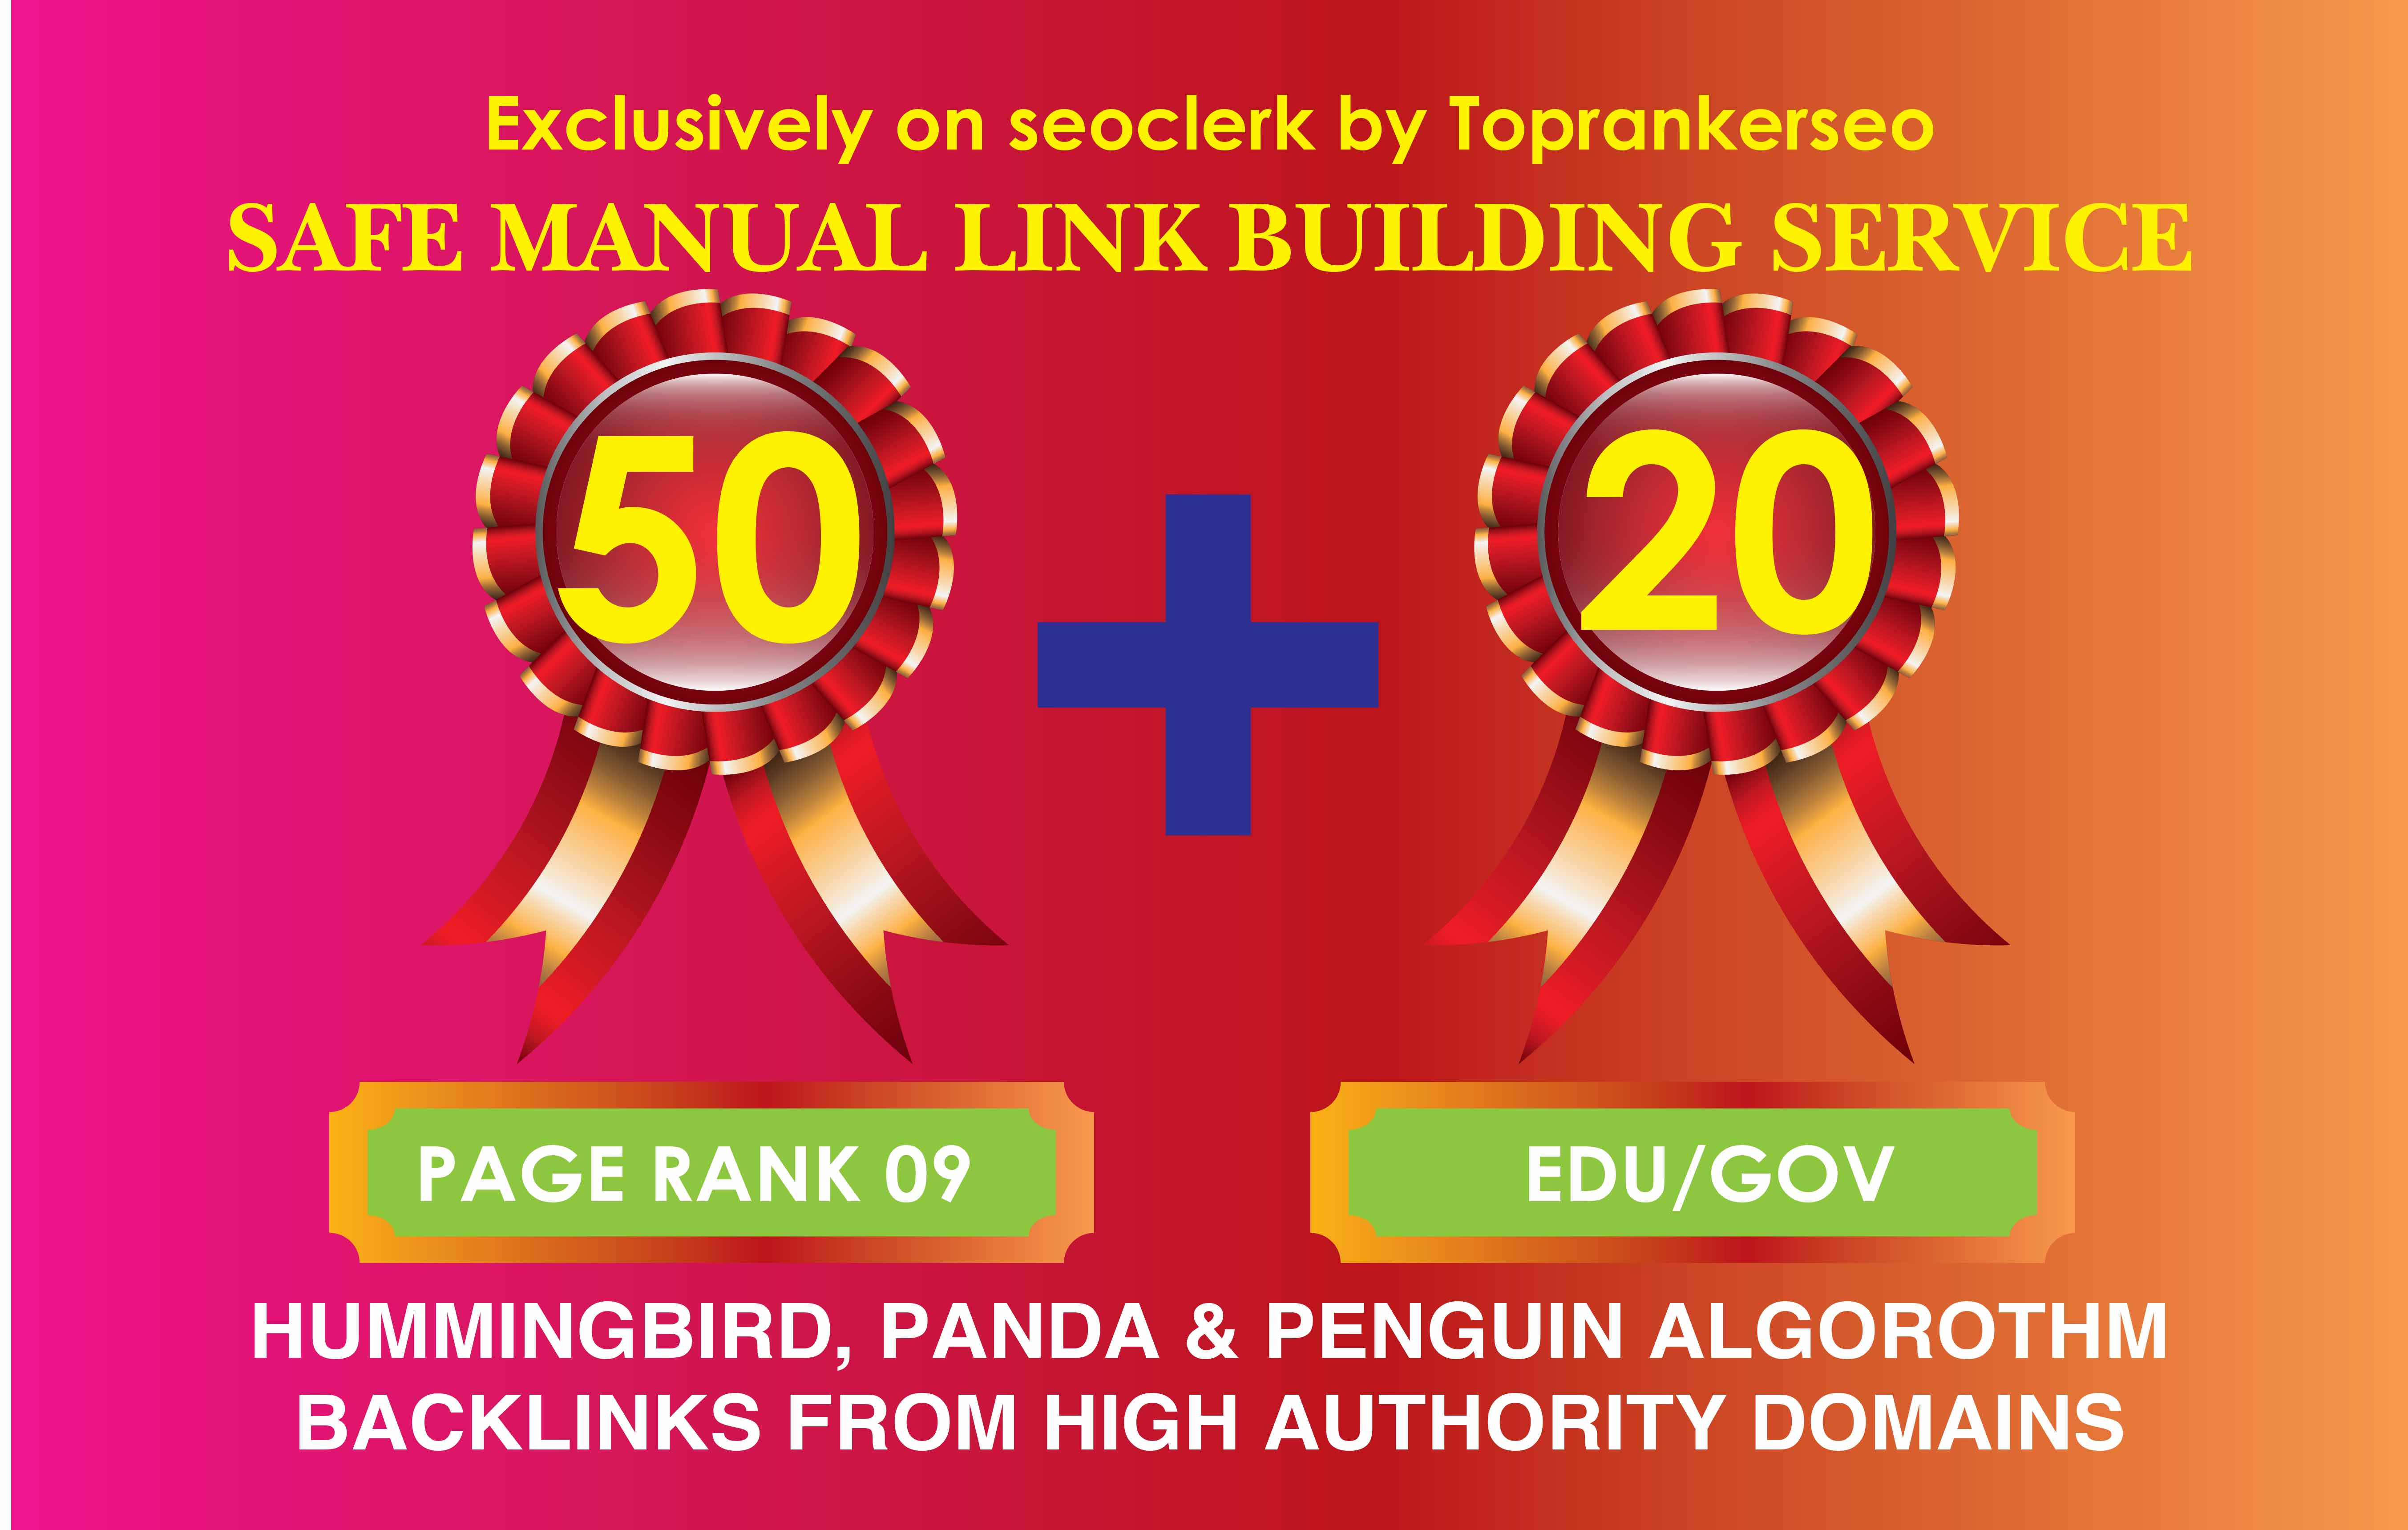 l will manually 50 pr9 +20 edu/gov sate seo backlink service 2020